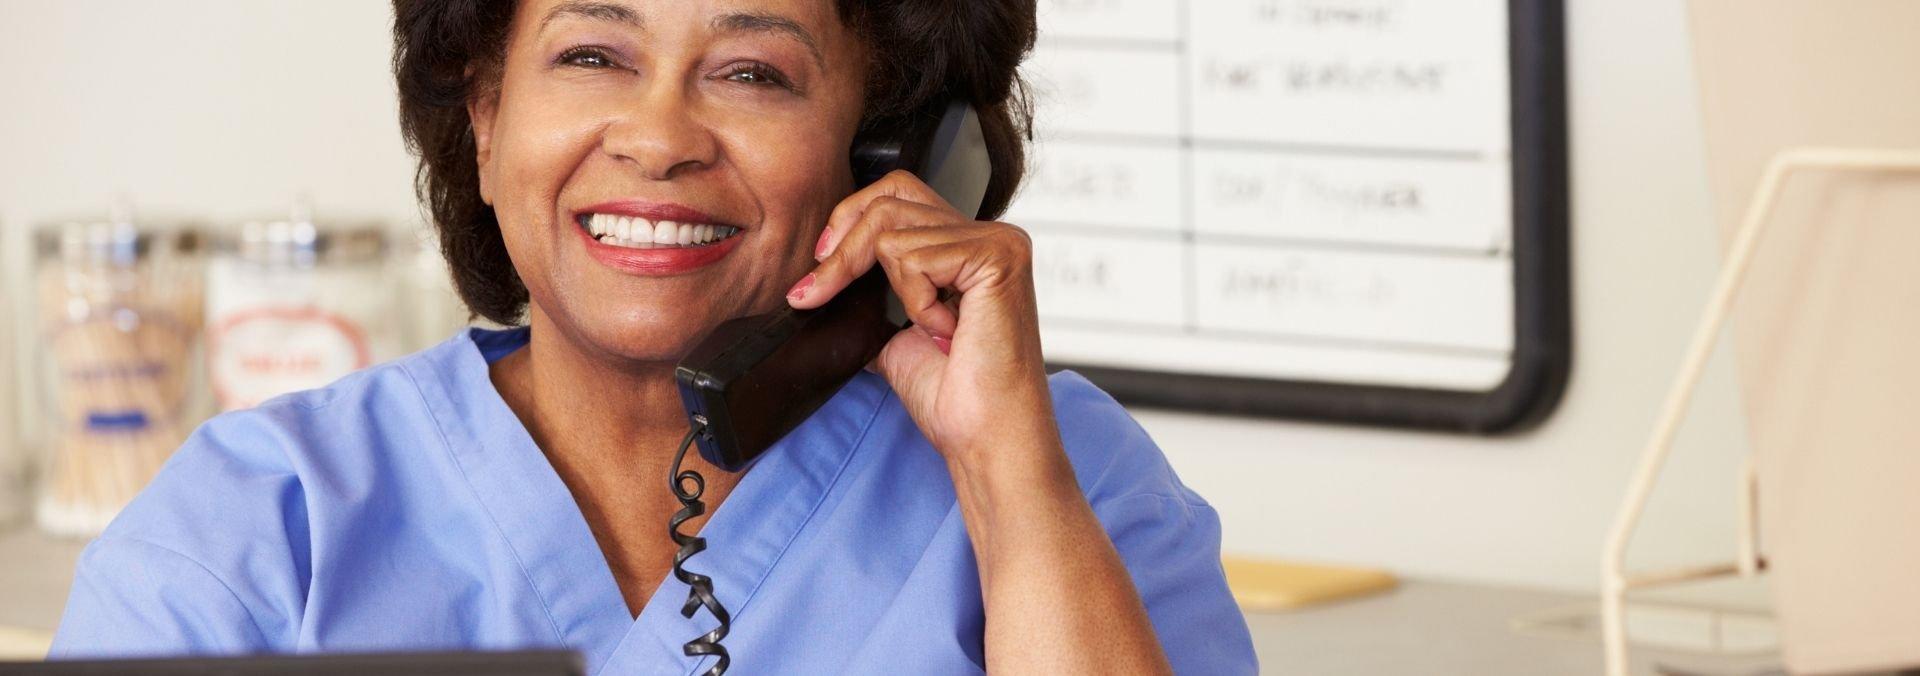 health unit coordinator on phone